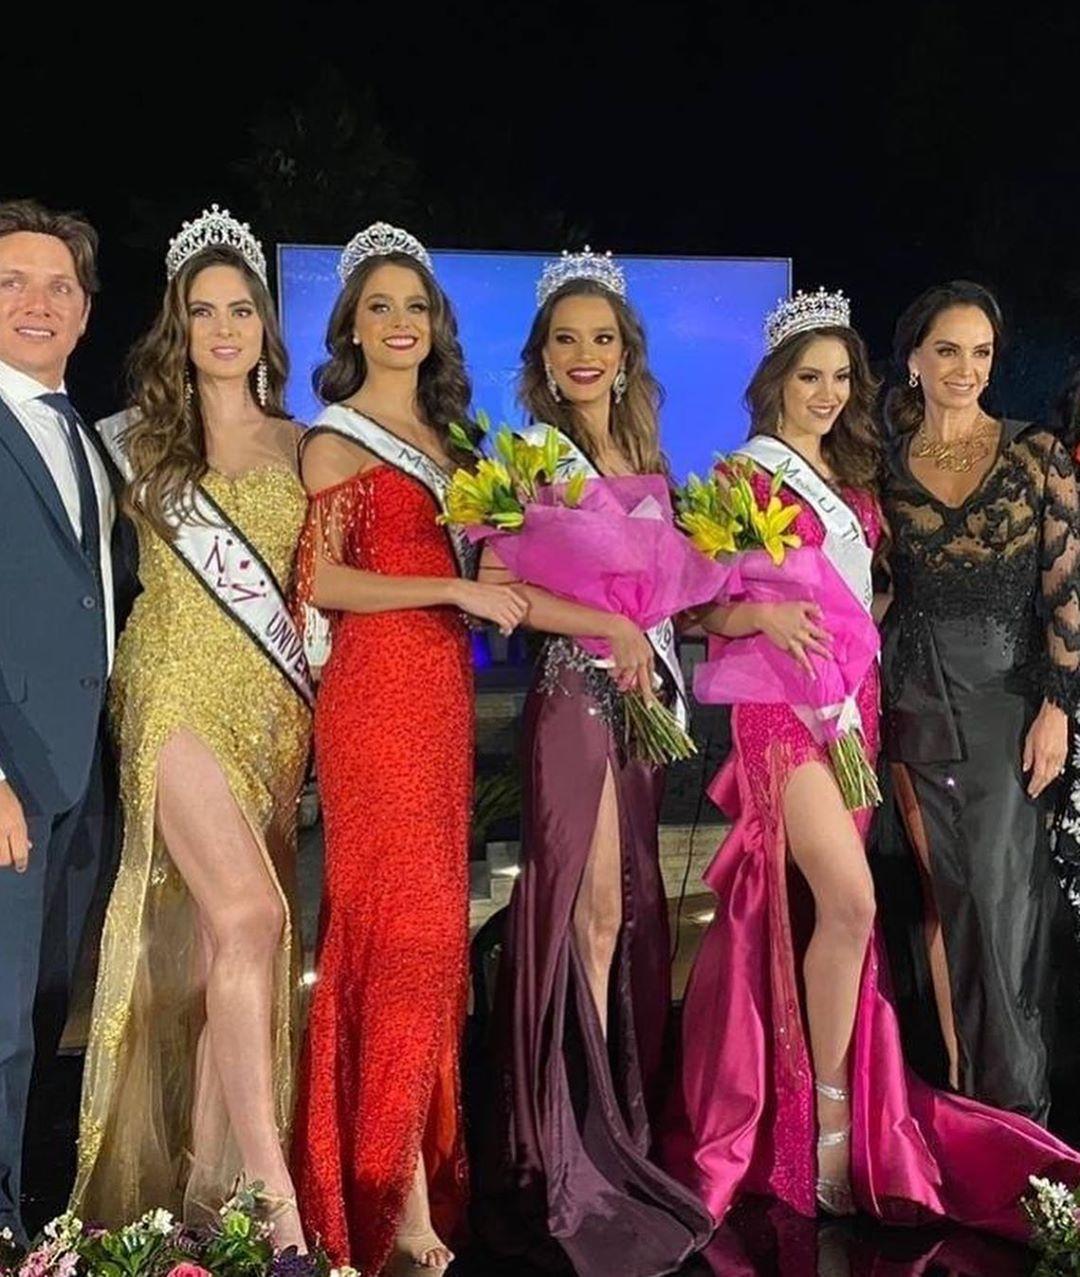 regina peredo, reyna hispanoamericana 2019. - Página 3 81340010